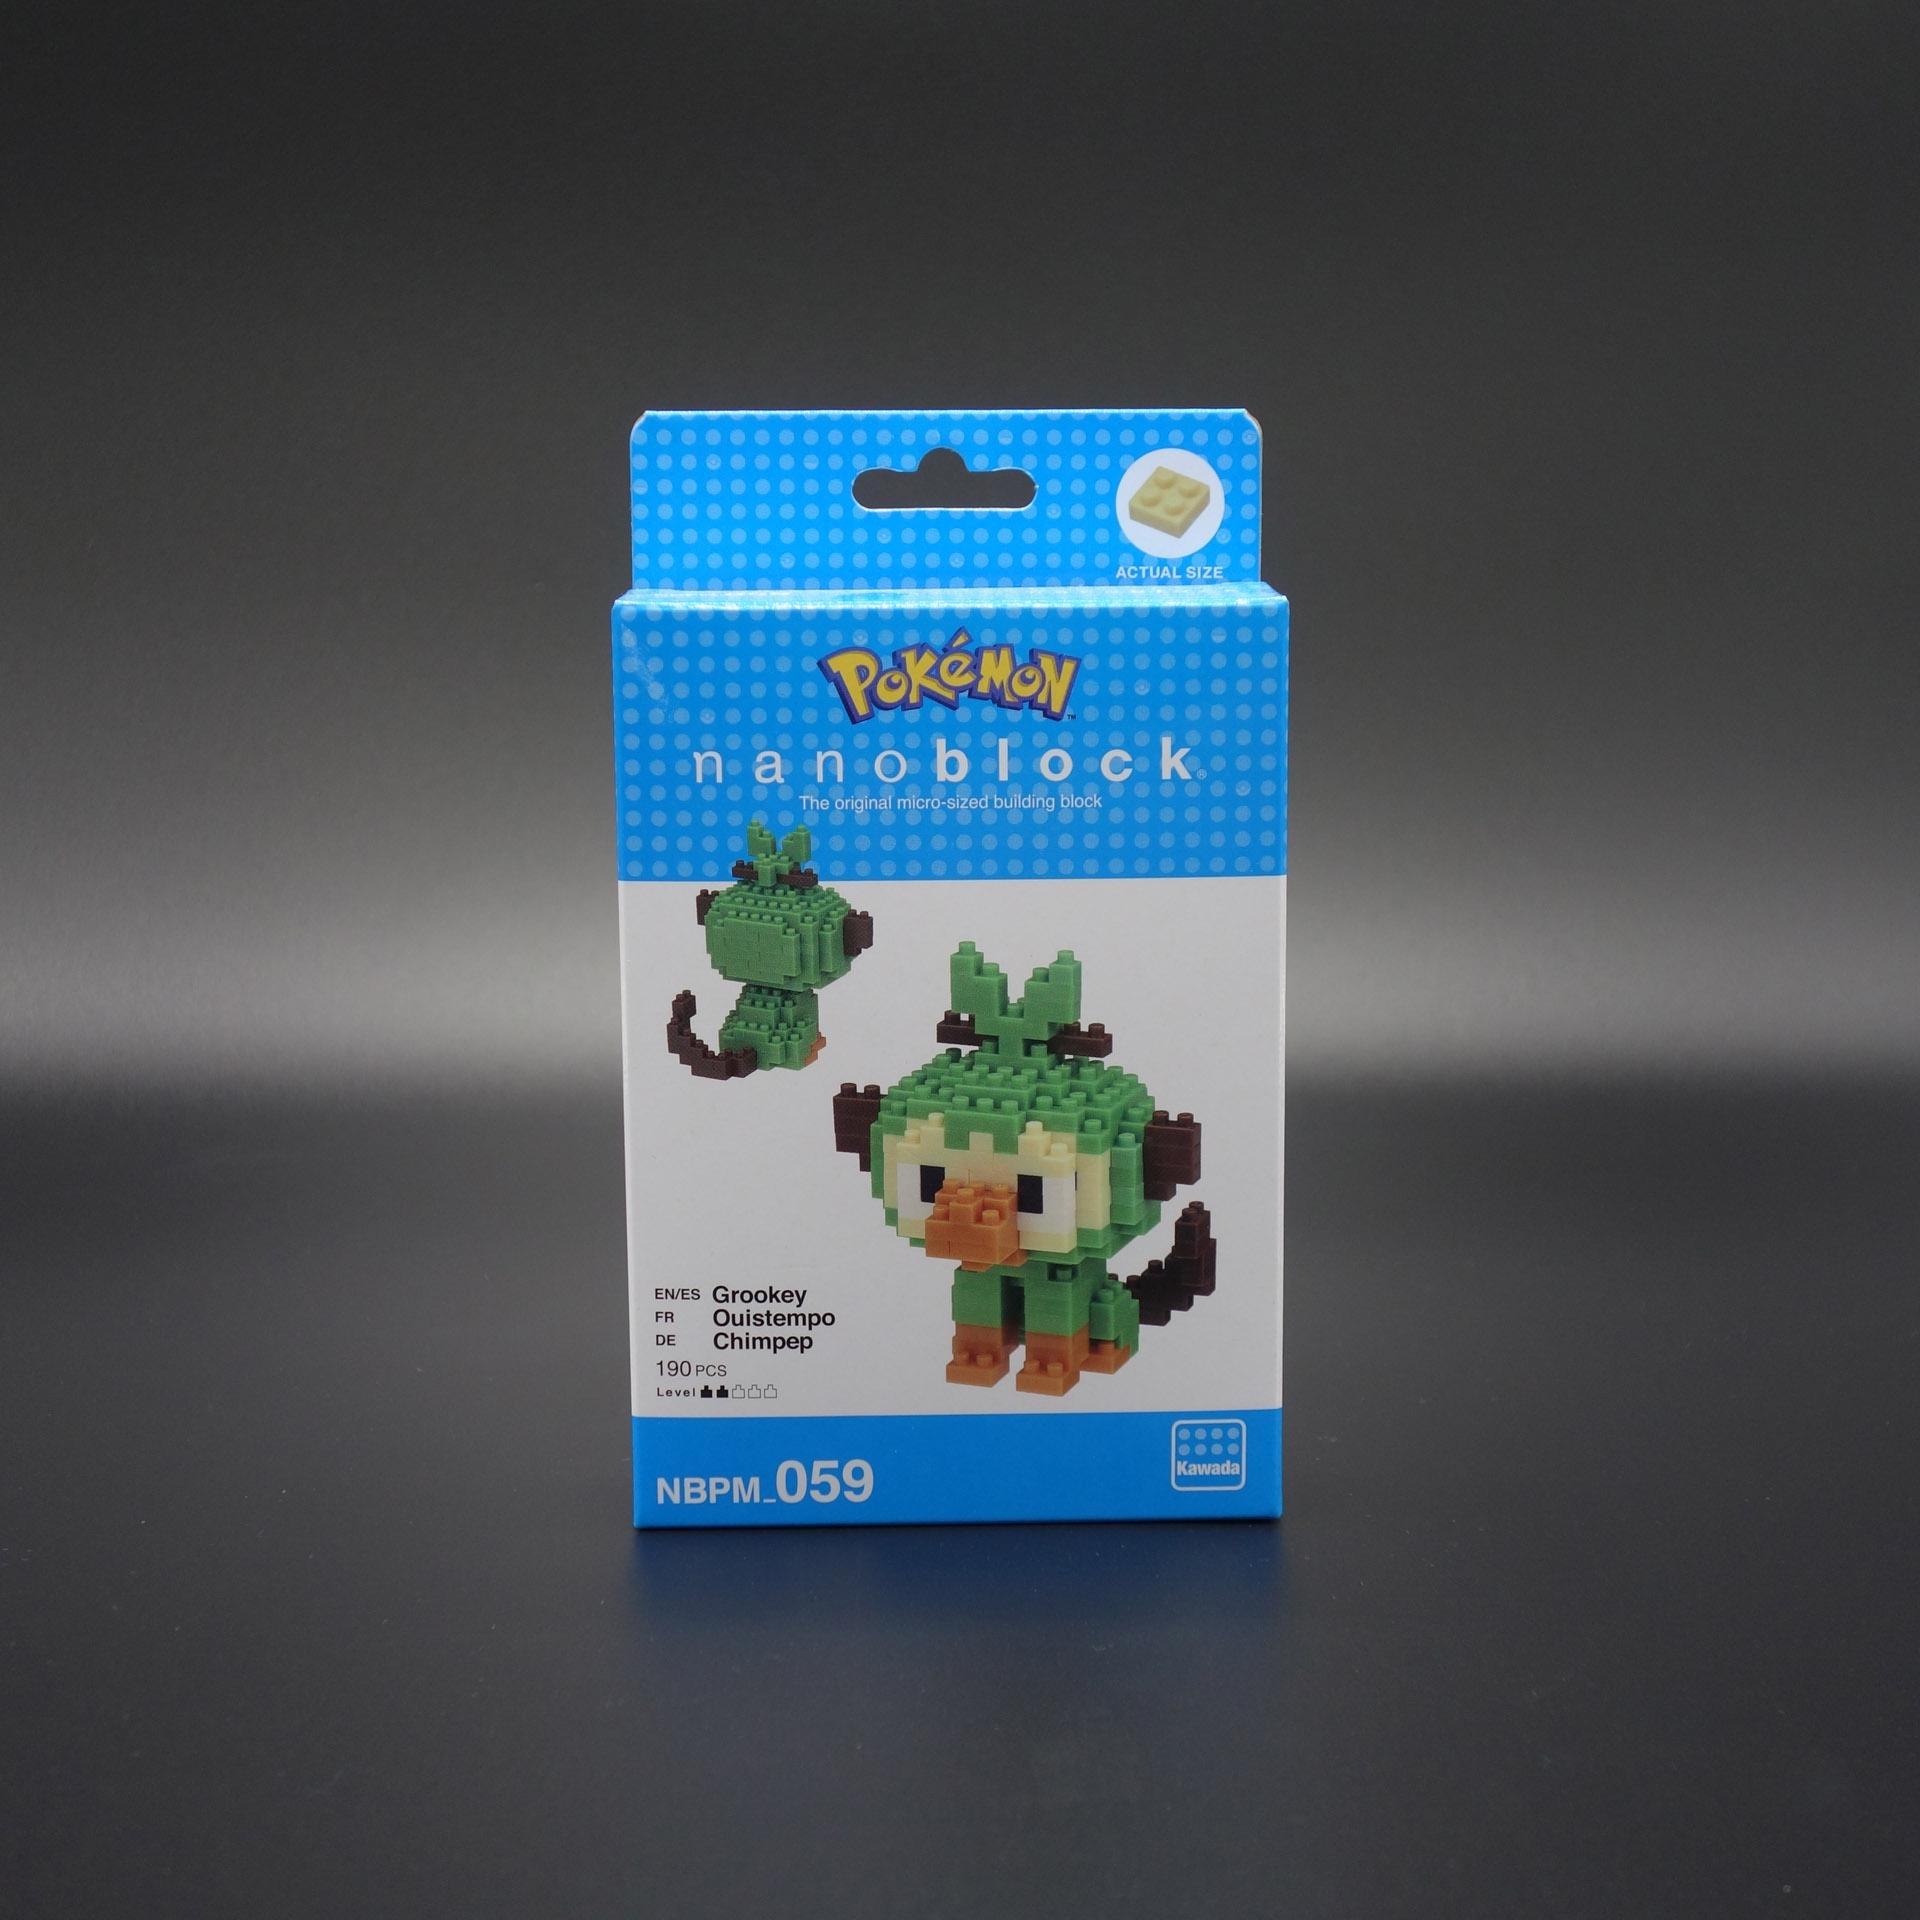 Pokemon nanoblock Chimpep